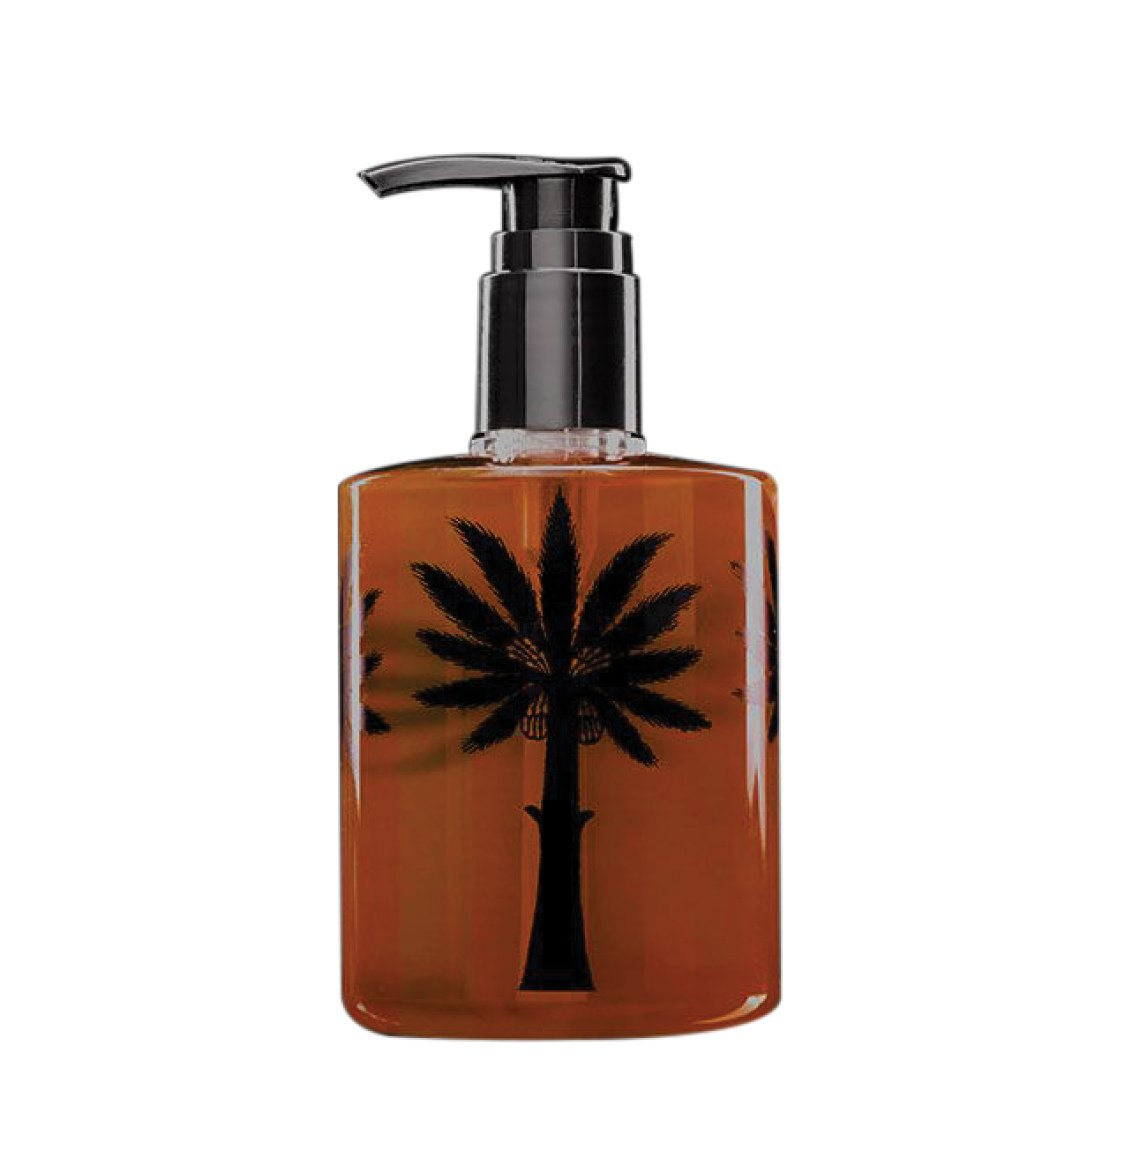 Ortigia Sicilia Ambra Nera Liquid Soap 300ml